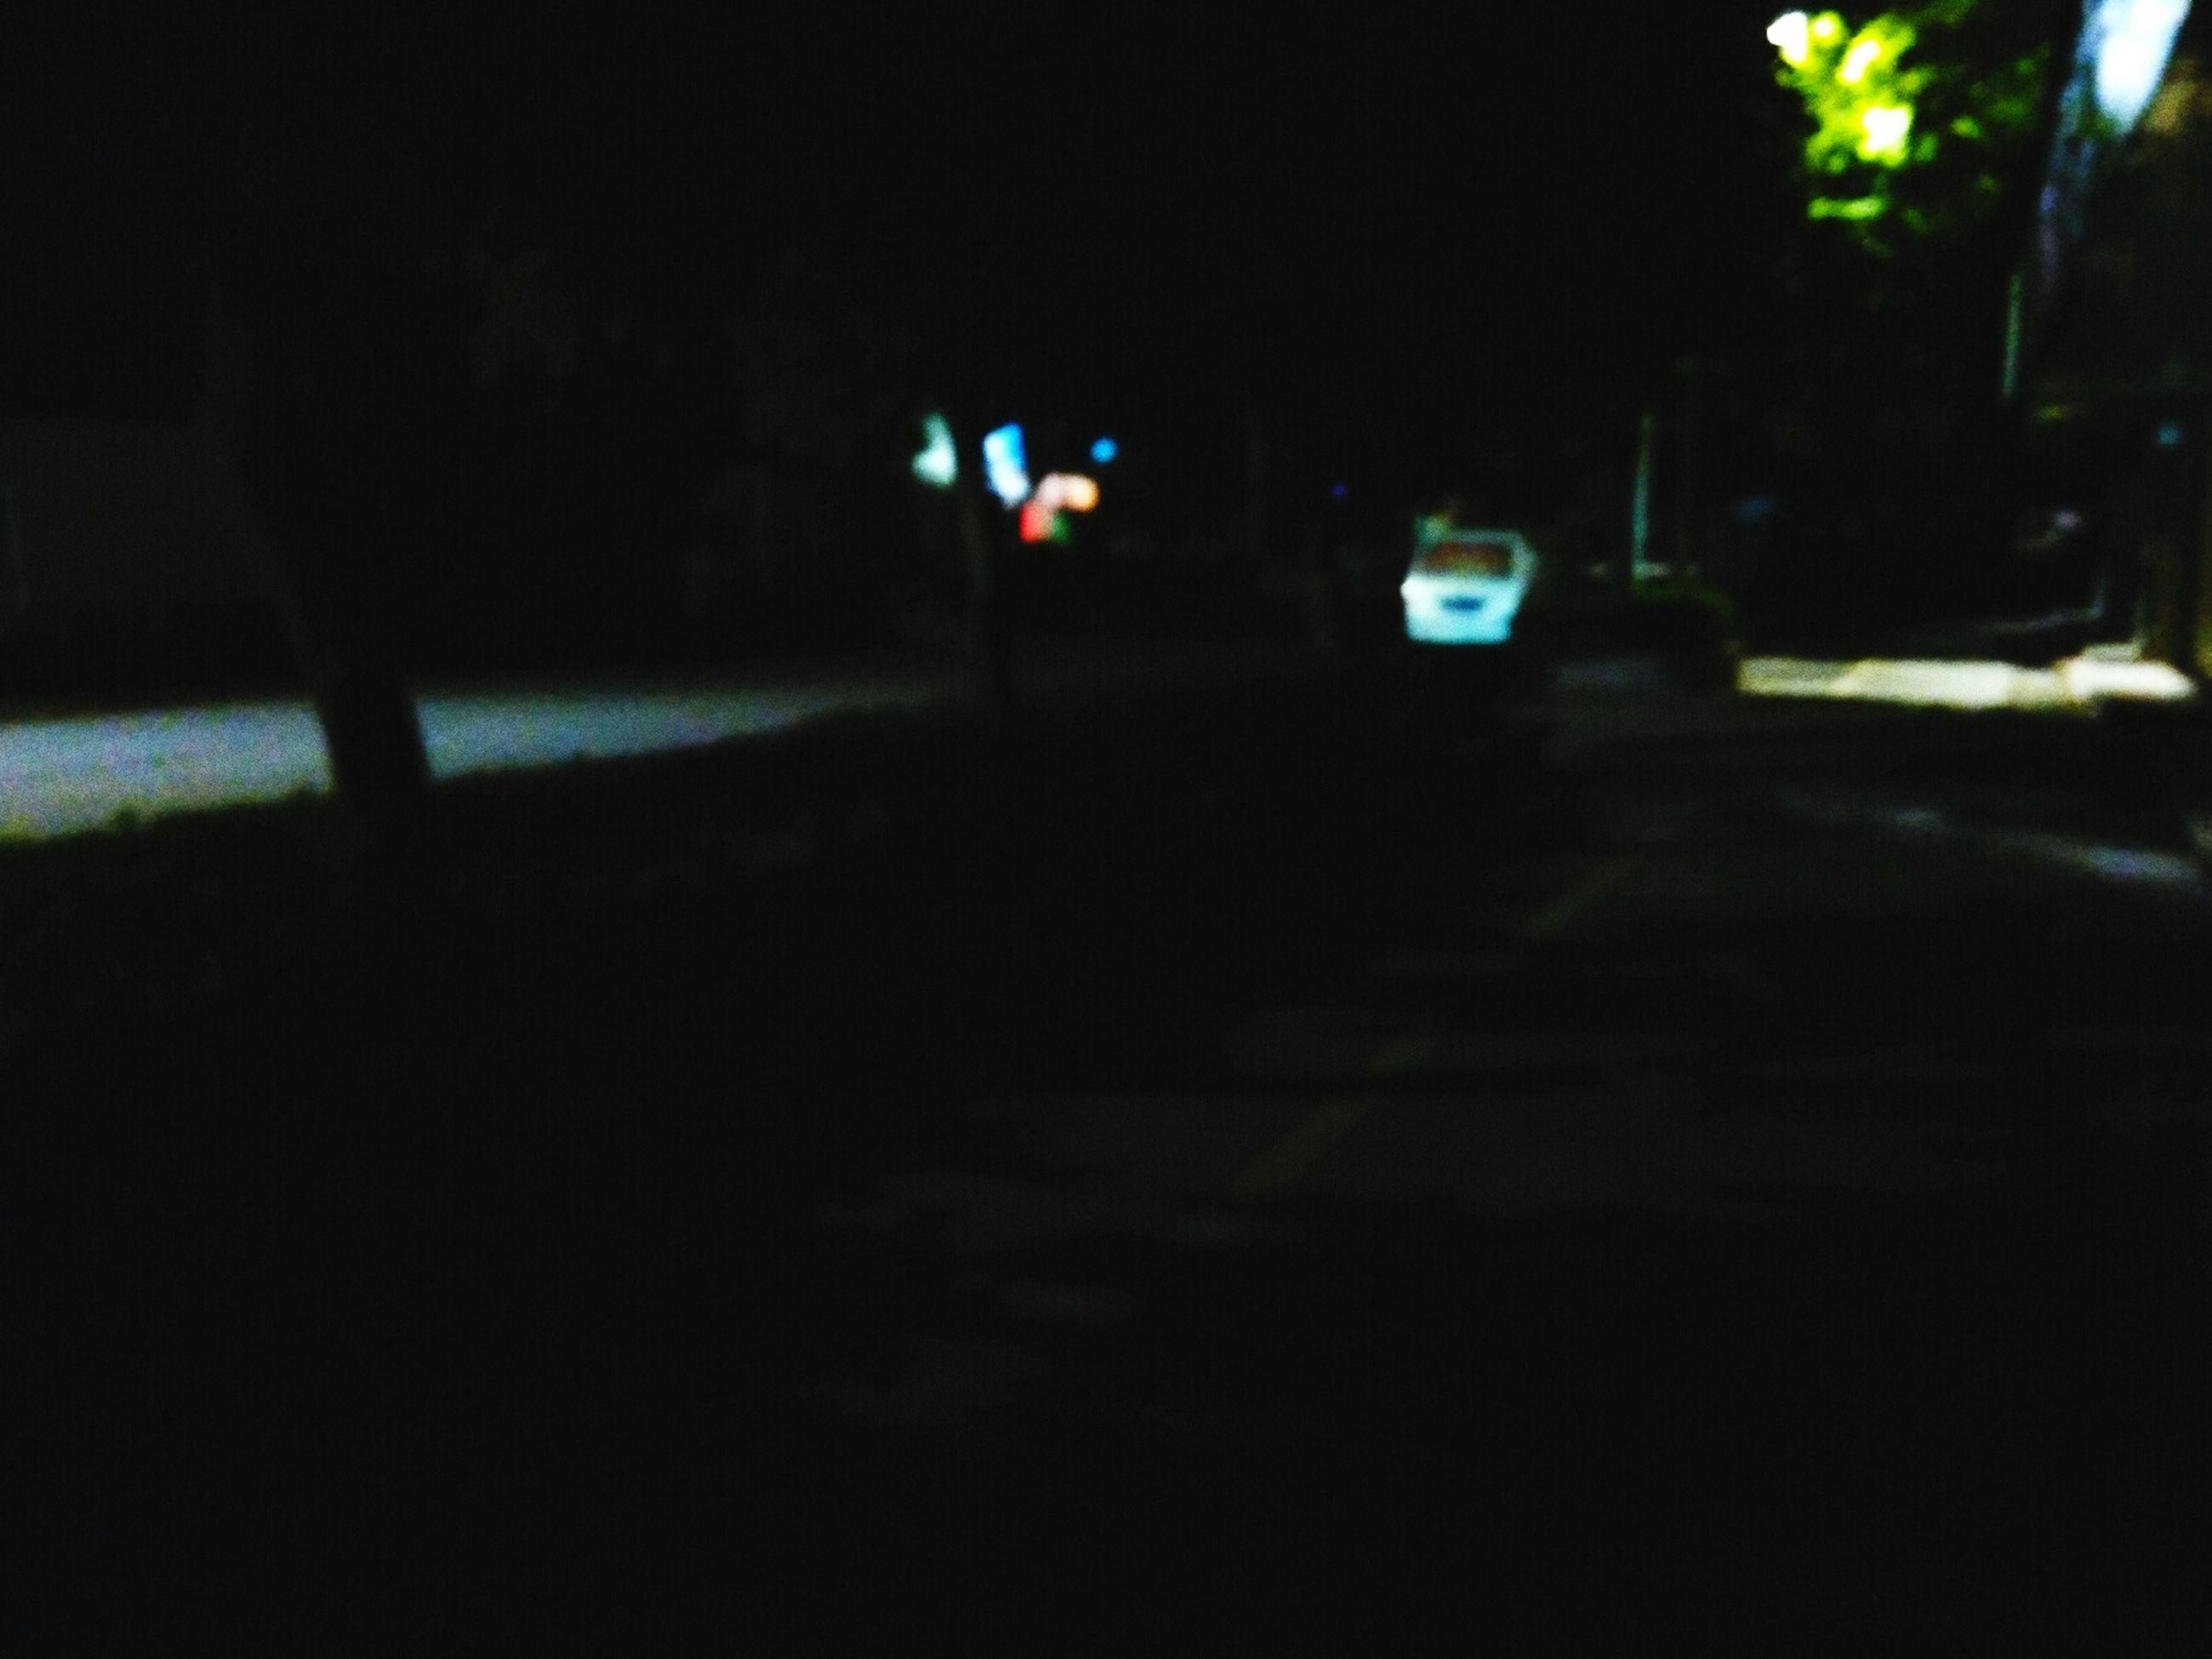 night, transportation, illuminated, street, car, land vehicle, road, mode of transport, dark, tree, street light, the way forward, silhouette, outdoors, empty, no people, road marking, city, lighting equipment, incidental people